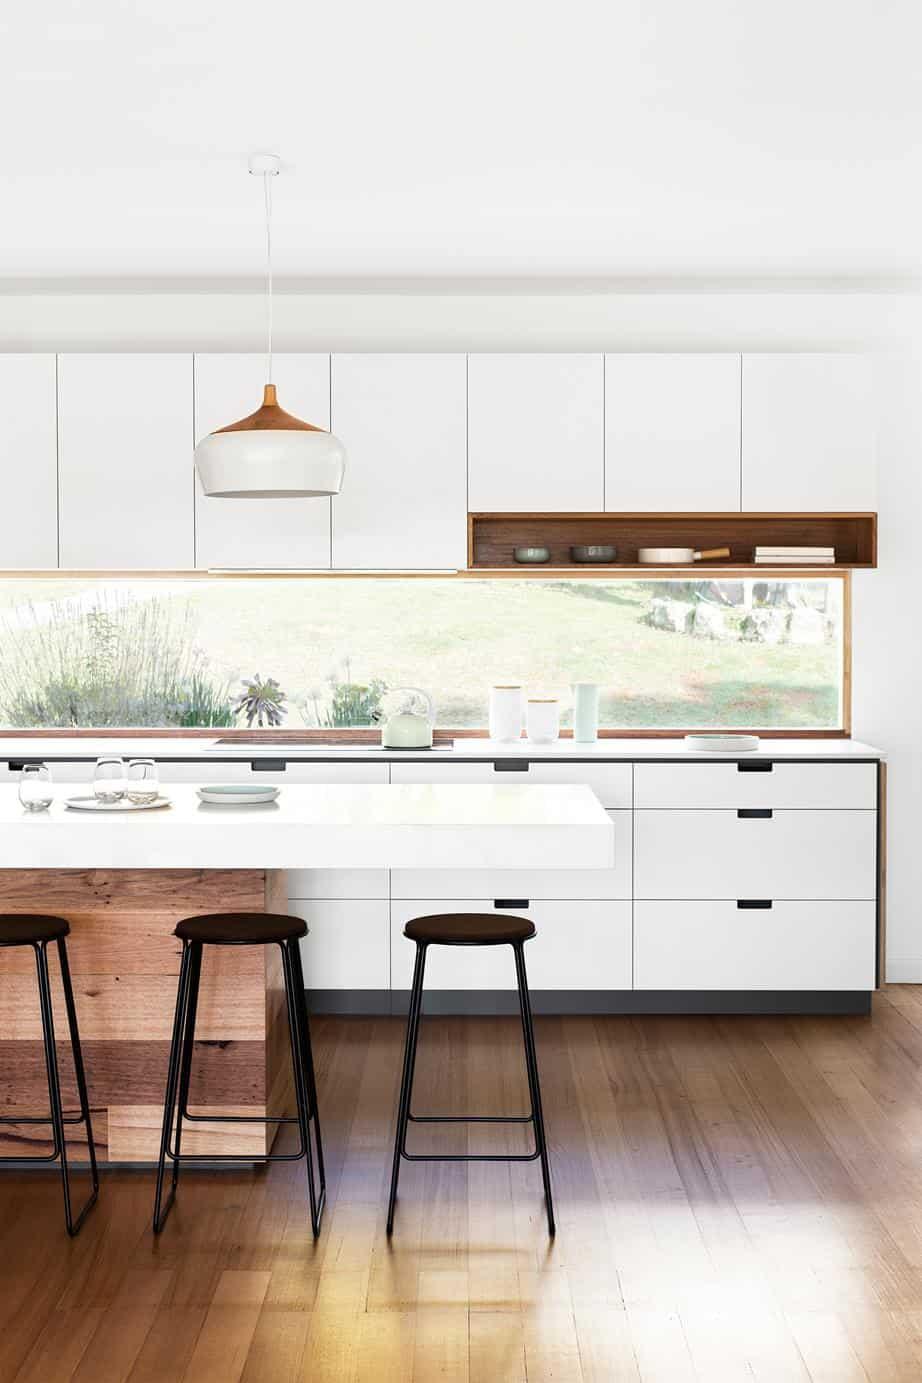 Window custom kitchen backsplash